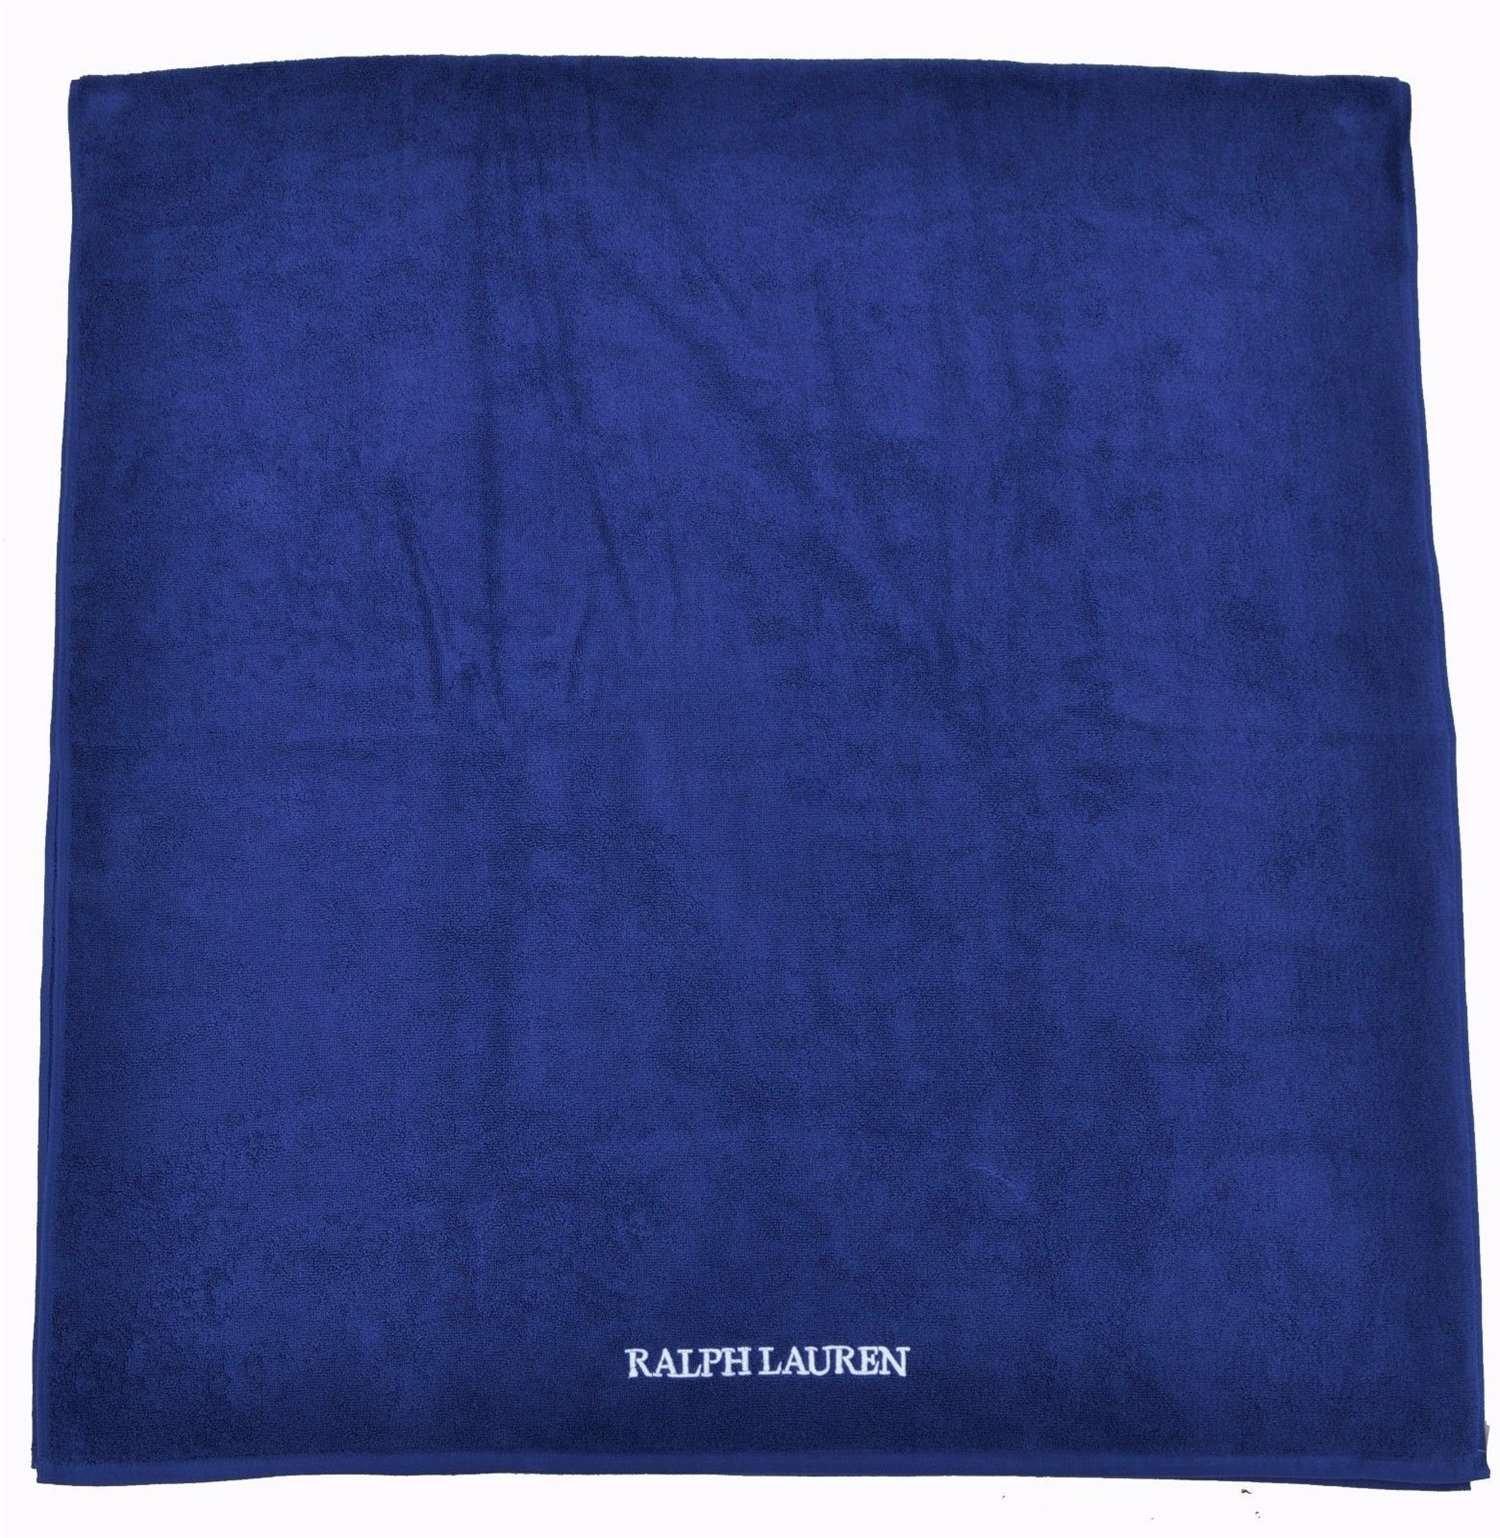 Polo Ralph Lauren baño y playa toalla de ducha: Amazon.es: Hogar